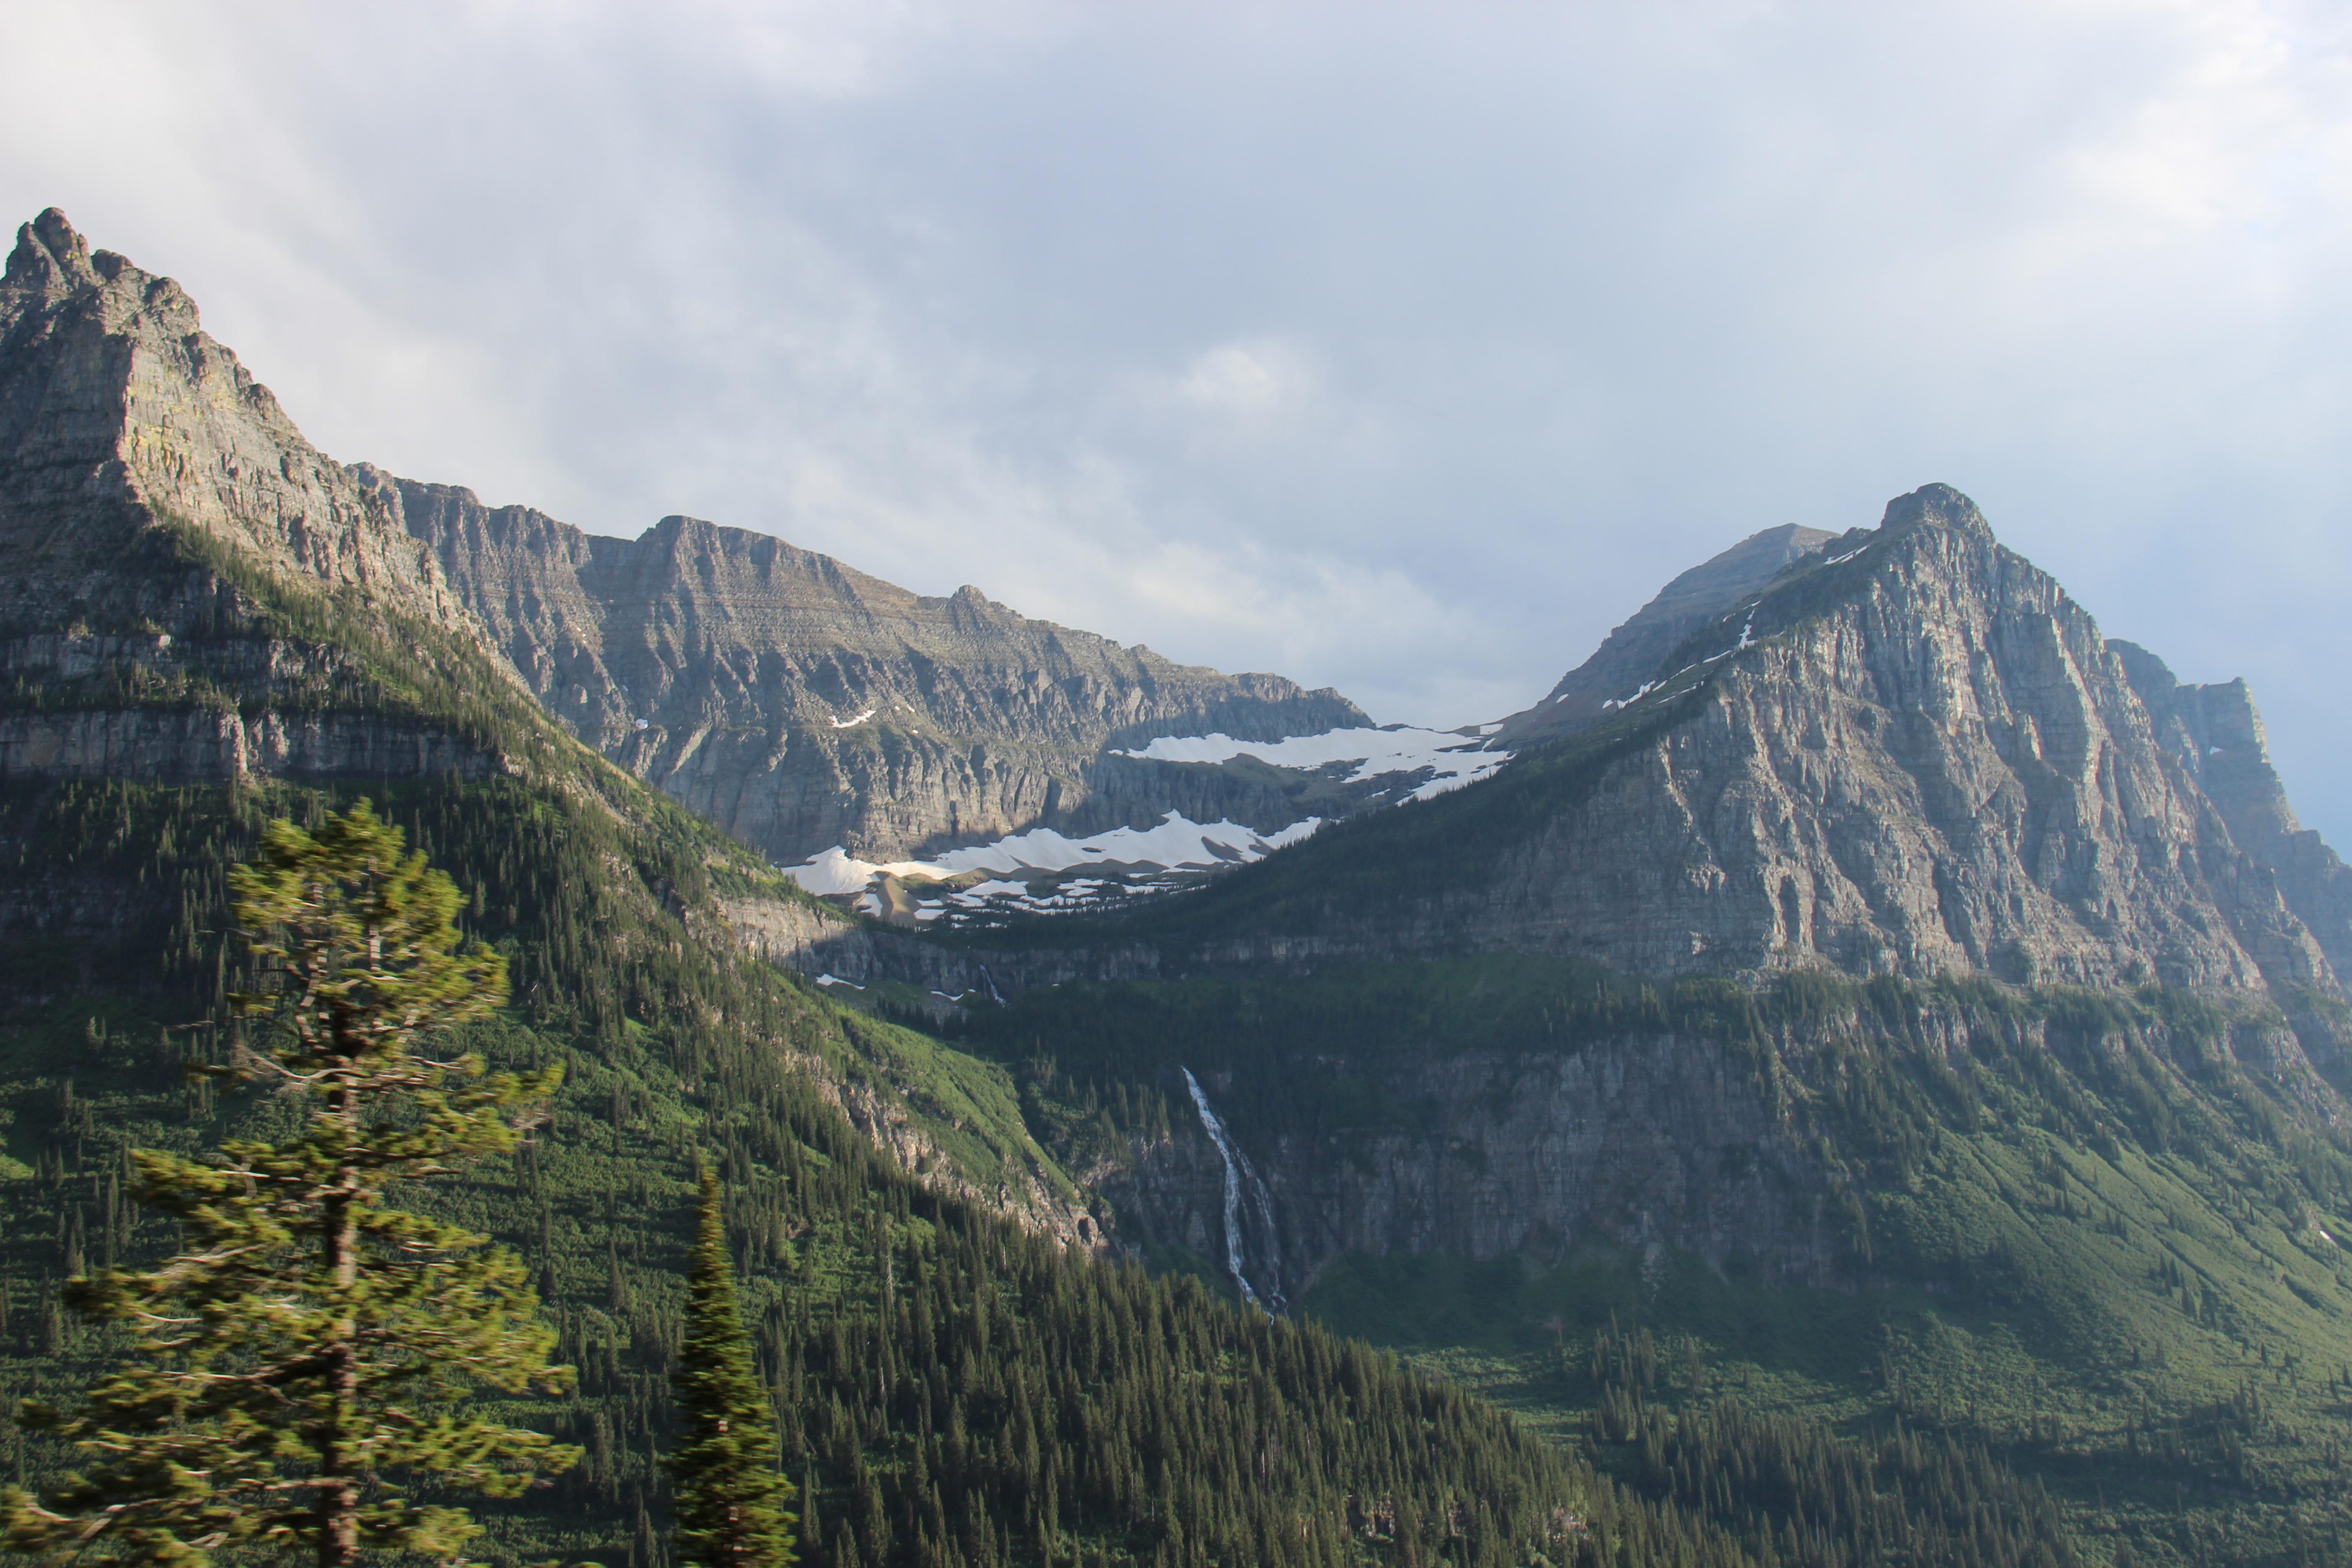 Road Trip Day 10 | Glacier National Park